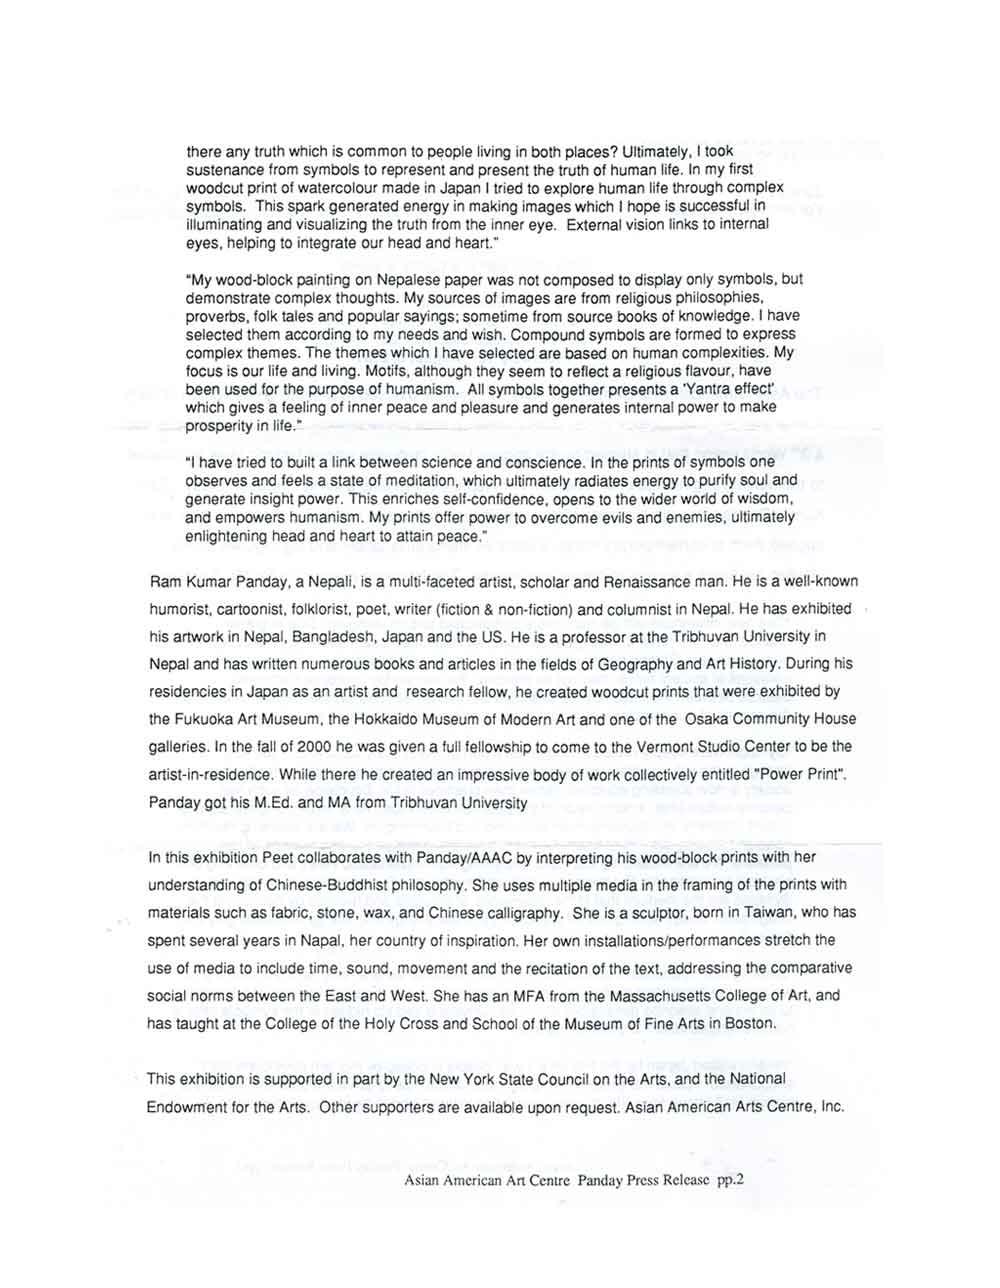 Power Print, press release, pg 2